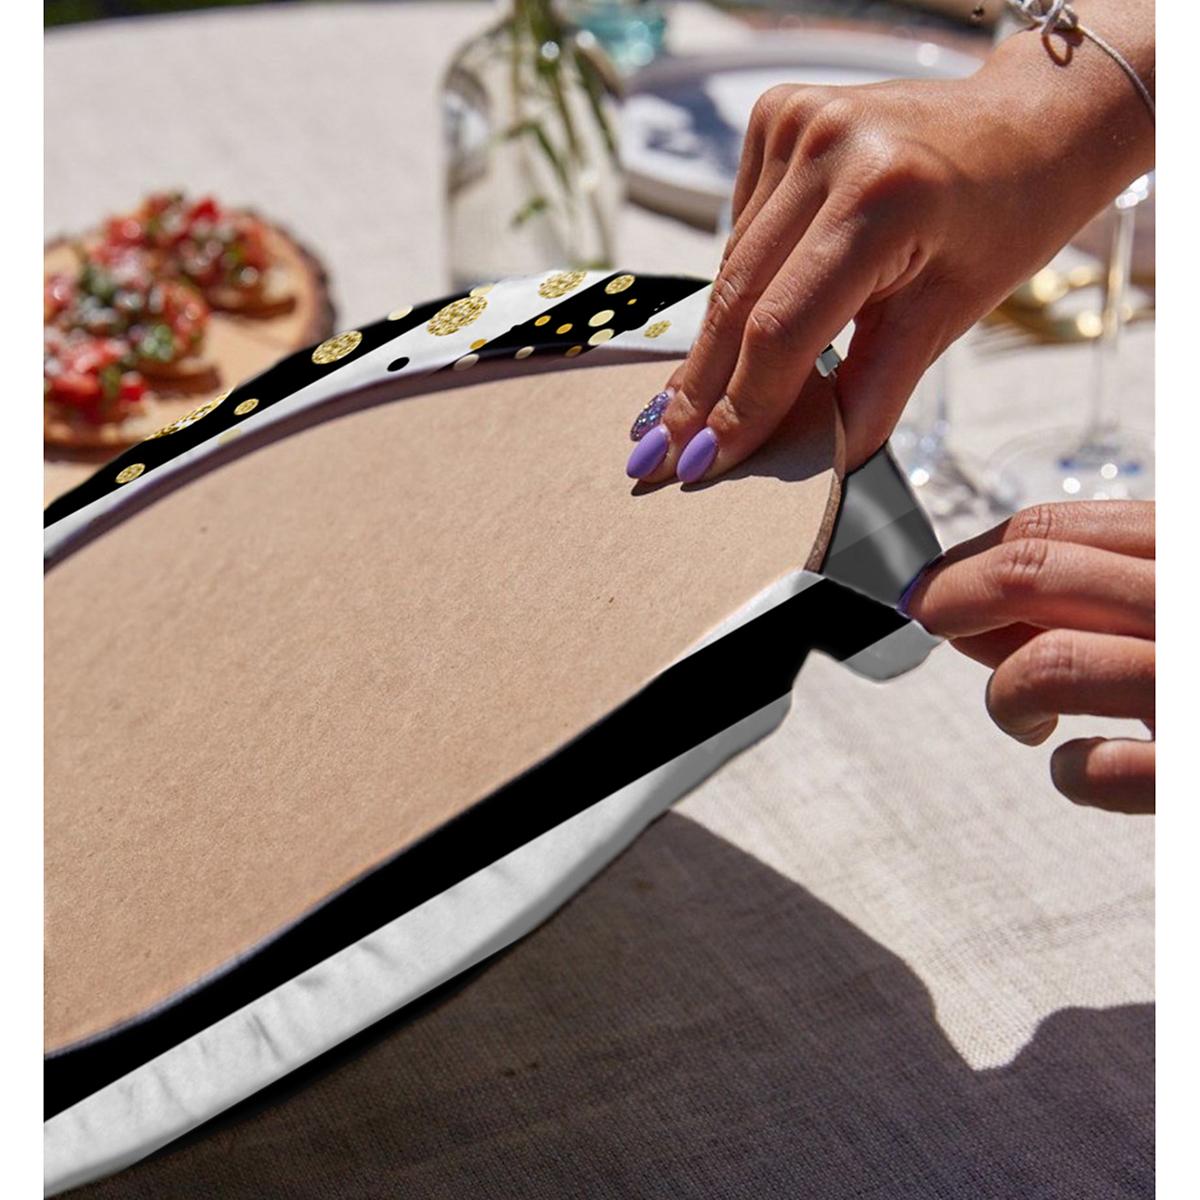 Realhomes Beyaz Zemin Üzerinde Siyah Çizgili Gold Detaylı Modern 2'li Yuvarlak Servis Altlığı - Supla Realhomes